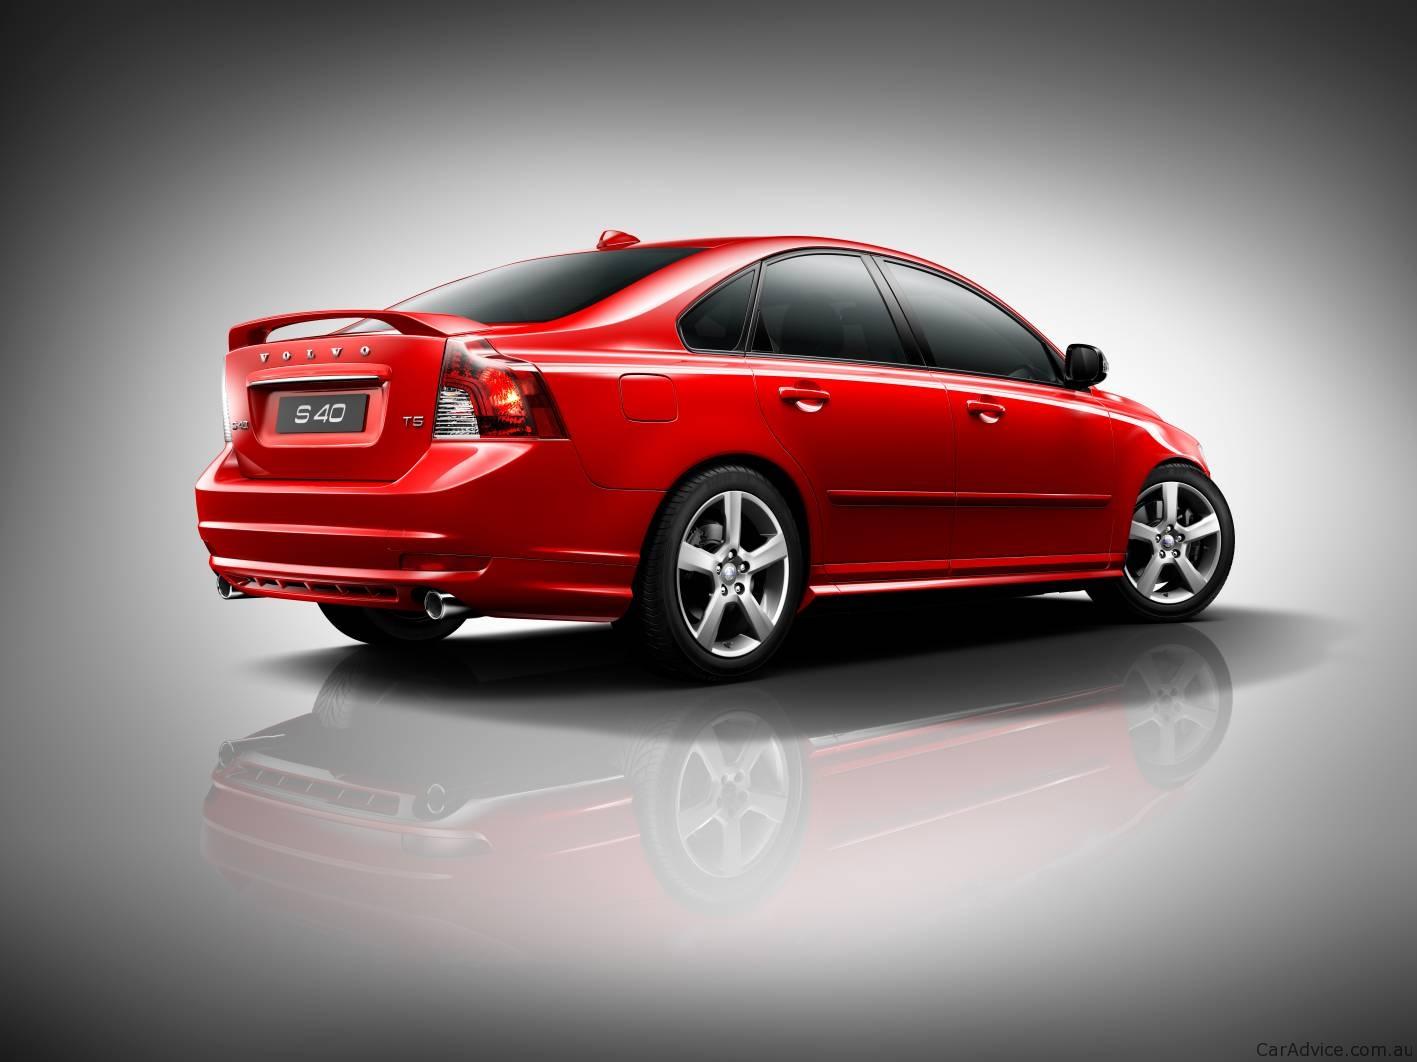 2012 Volvo S40, V50 updates on sale in Australia - Photos ...